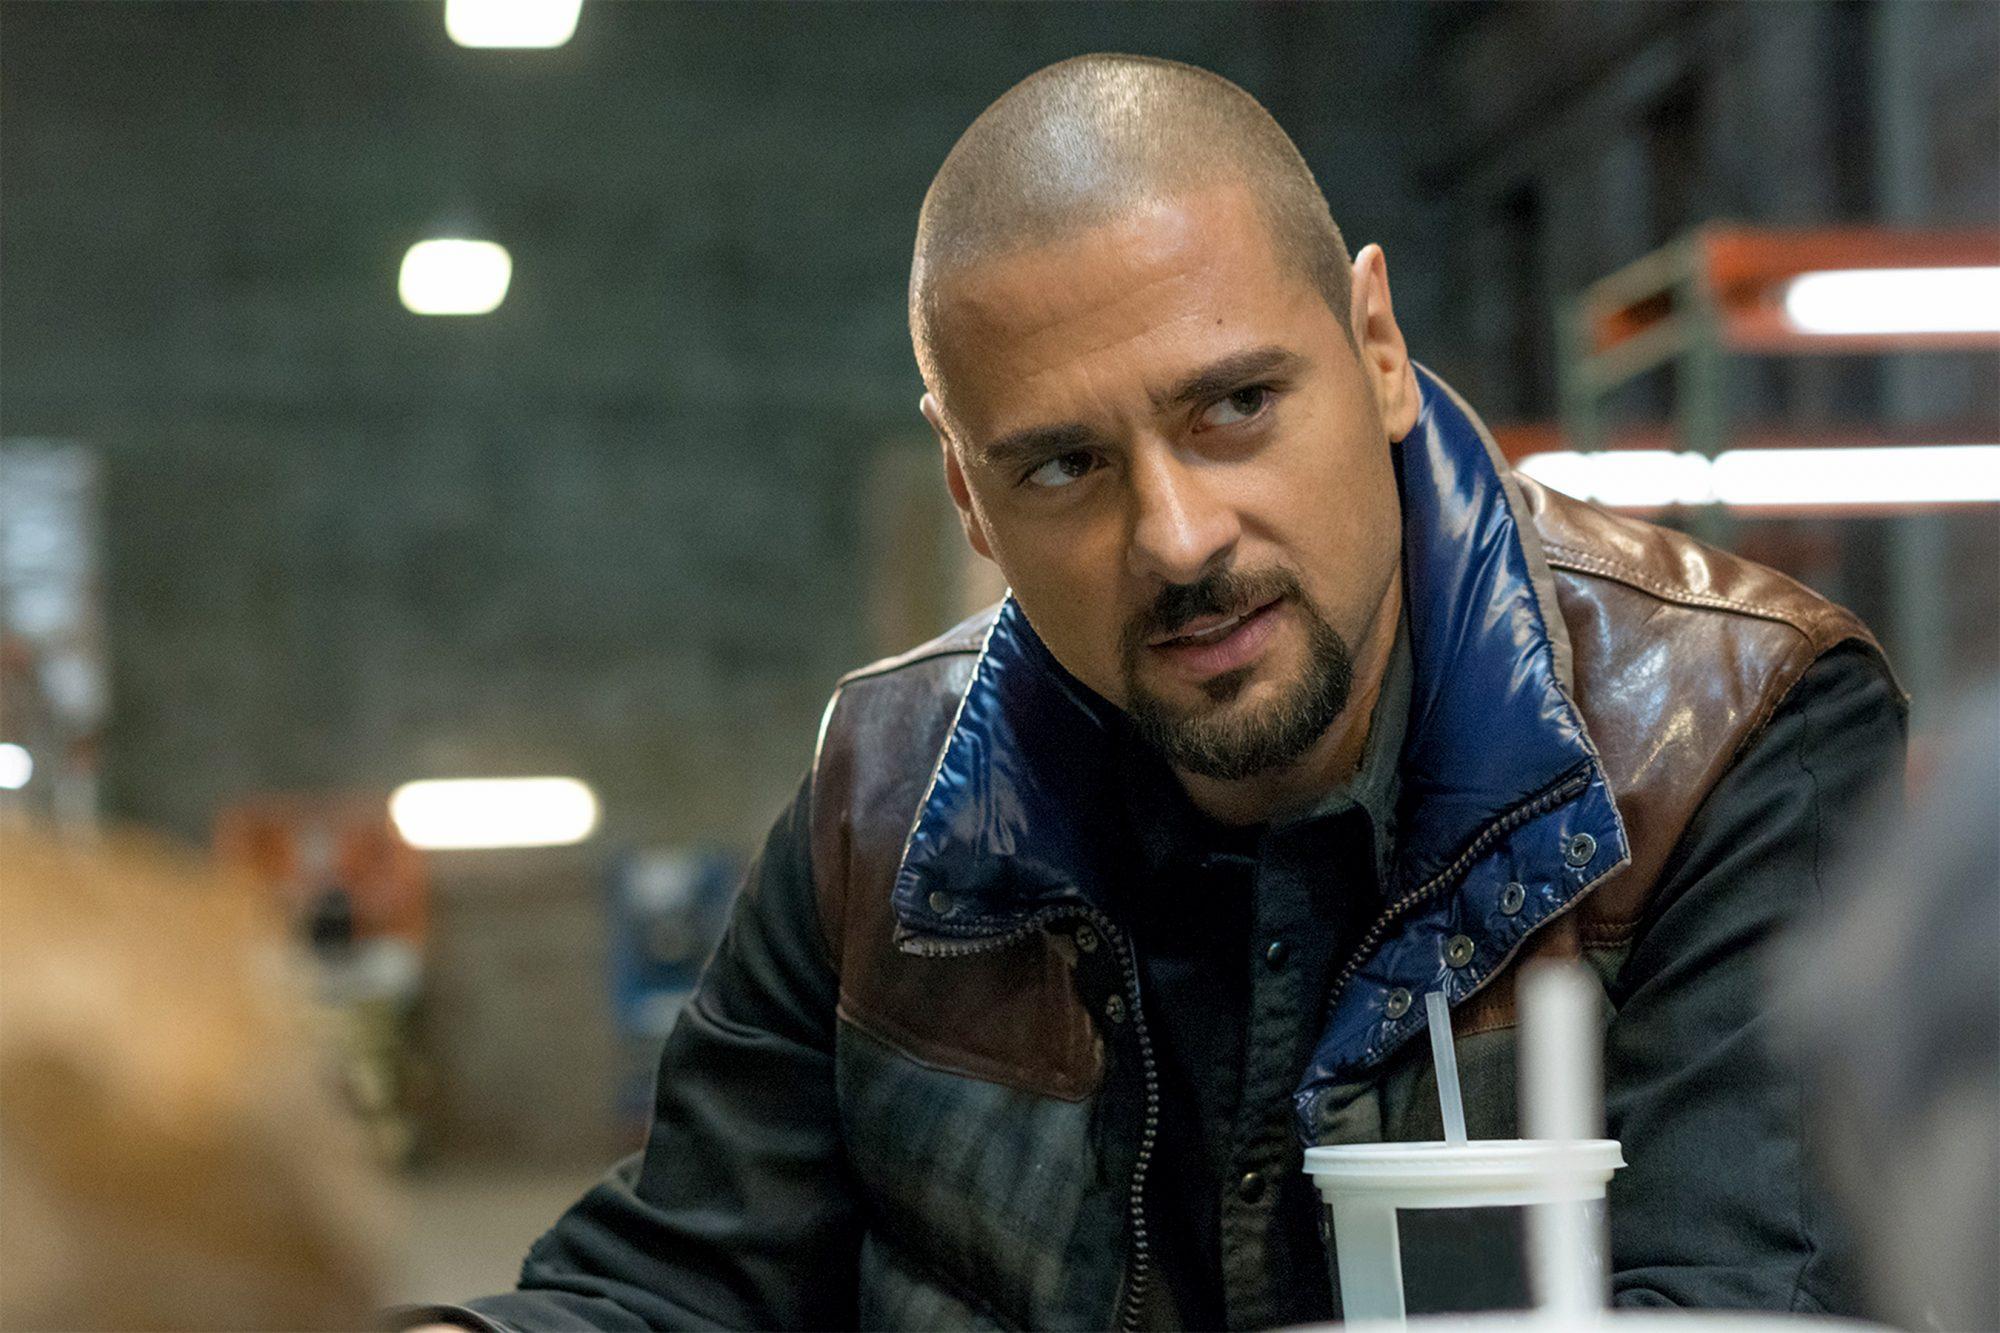 J.R. Raminez as Julio in Power